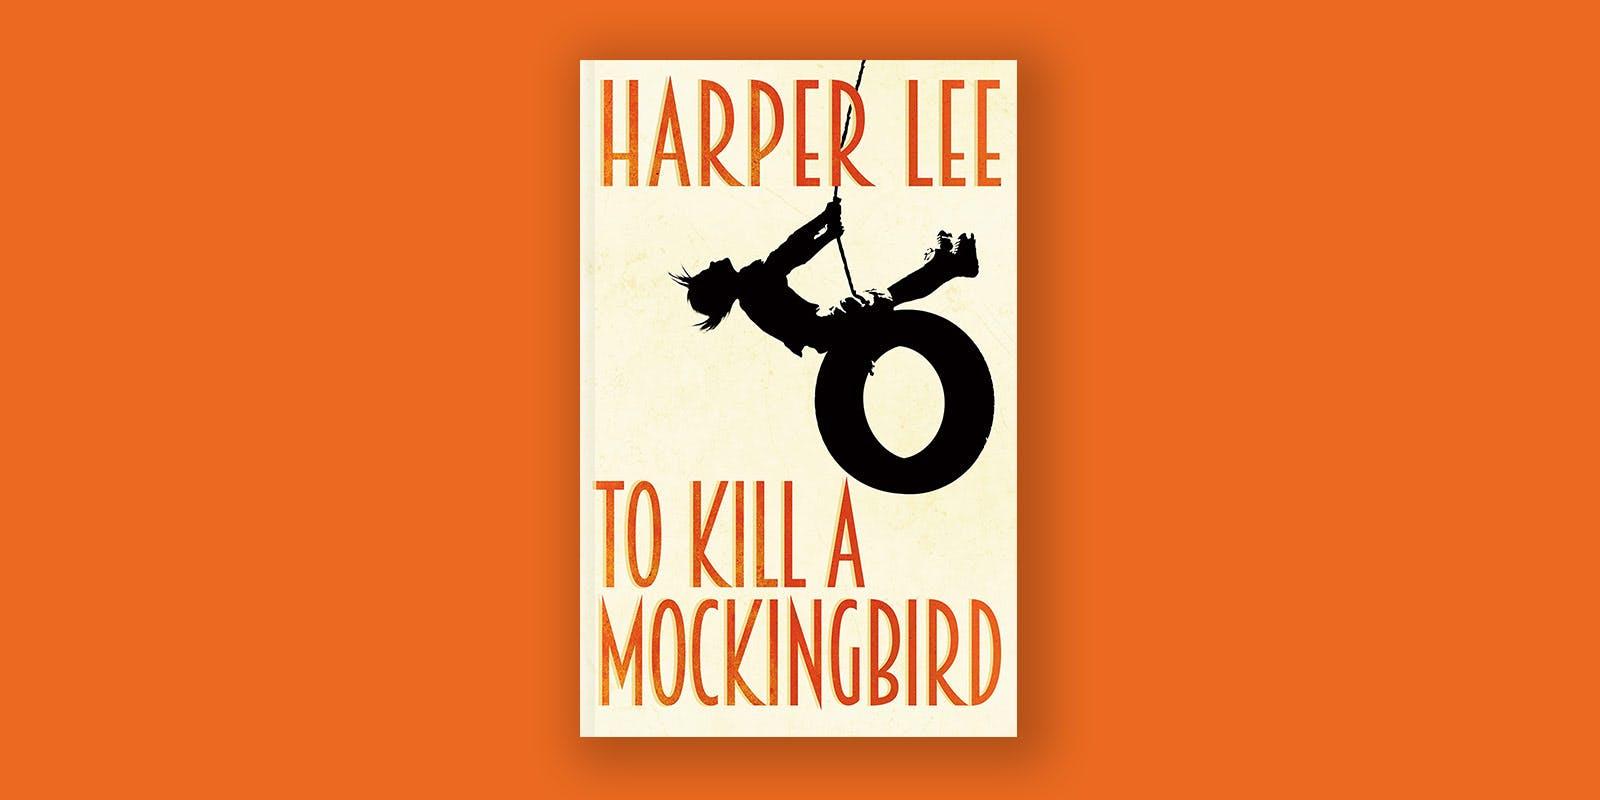 Mockingbird Discussion Points